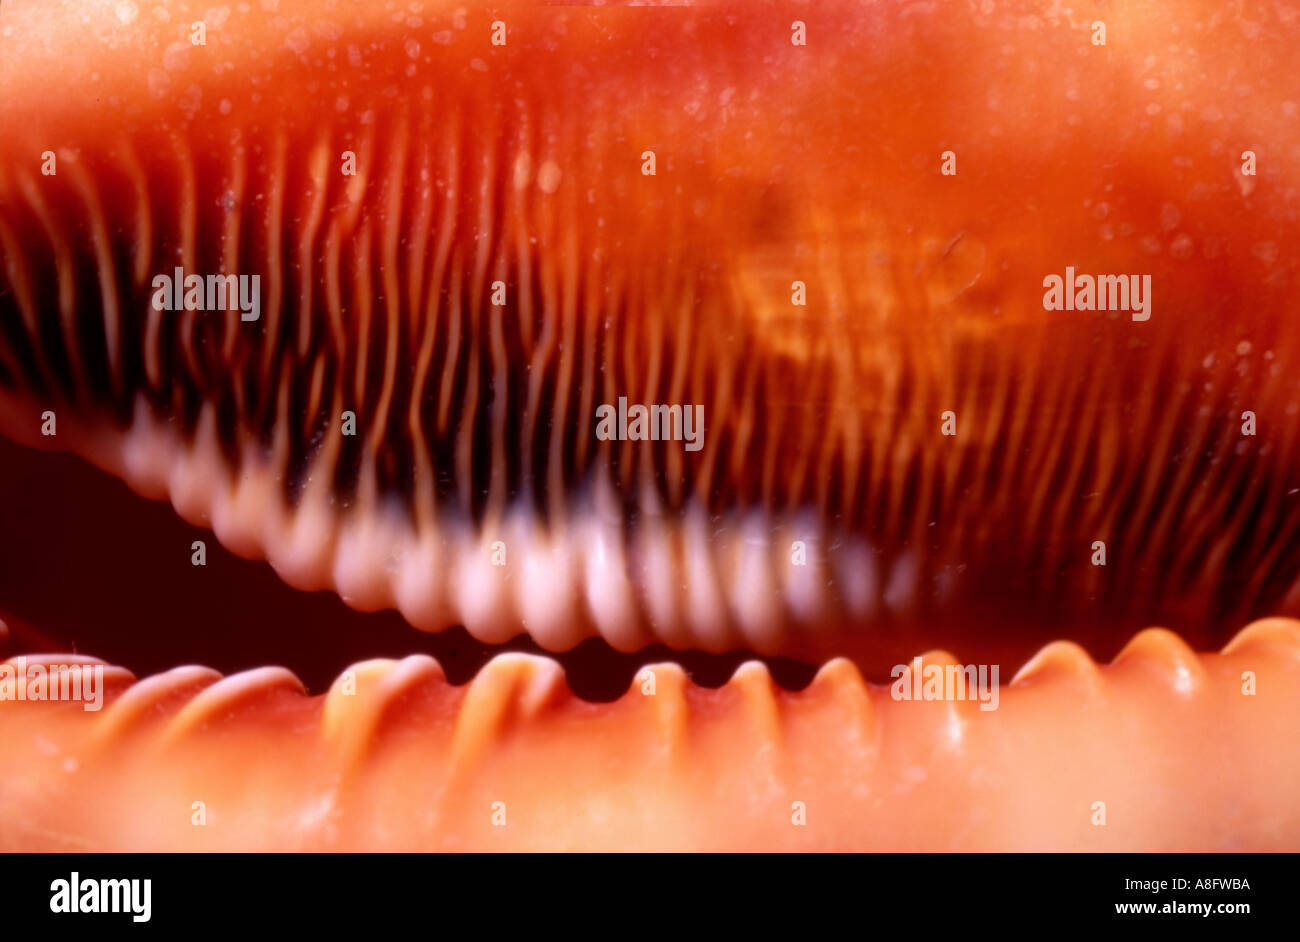 Moluscos de concha marina australiana macro abstracto shot de apertura de shell Imagen De Stock